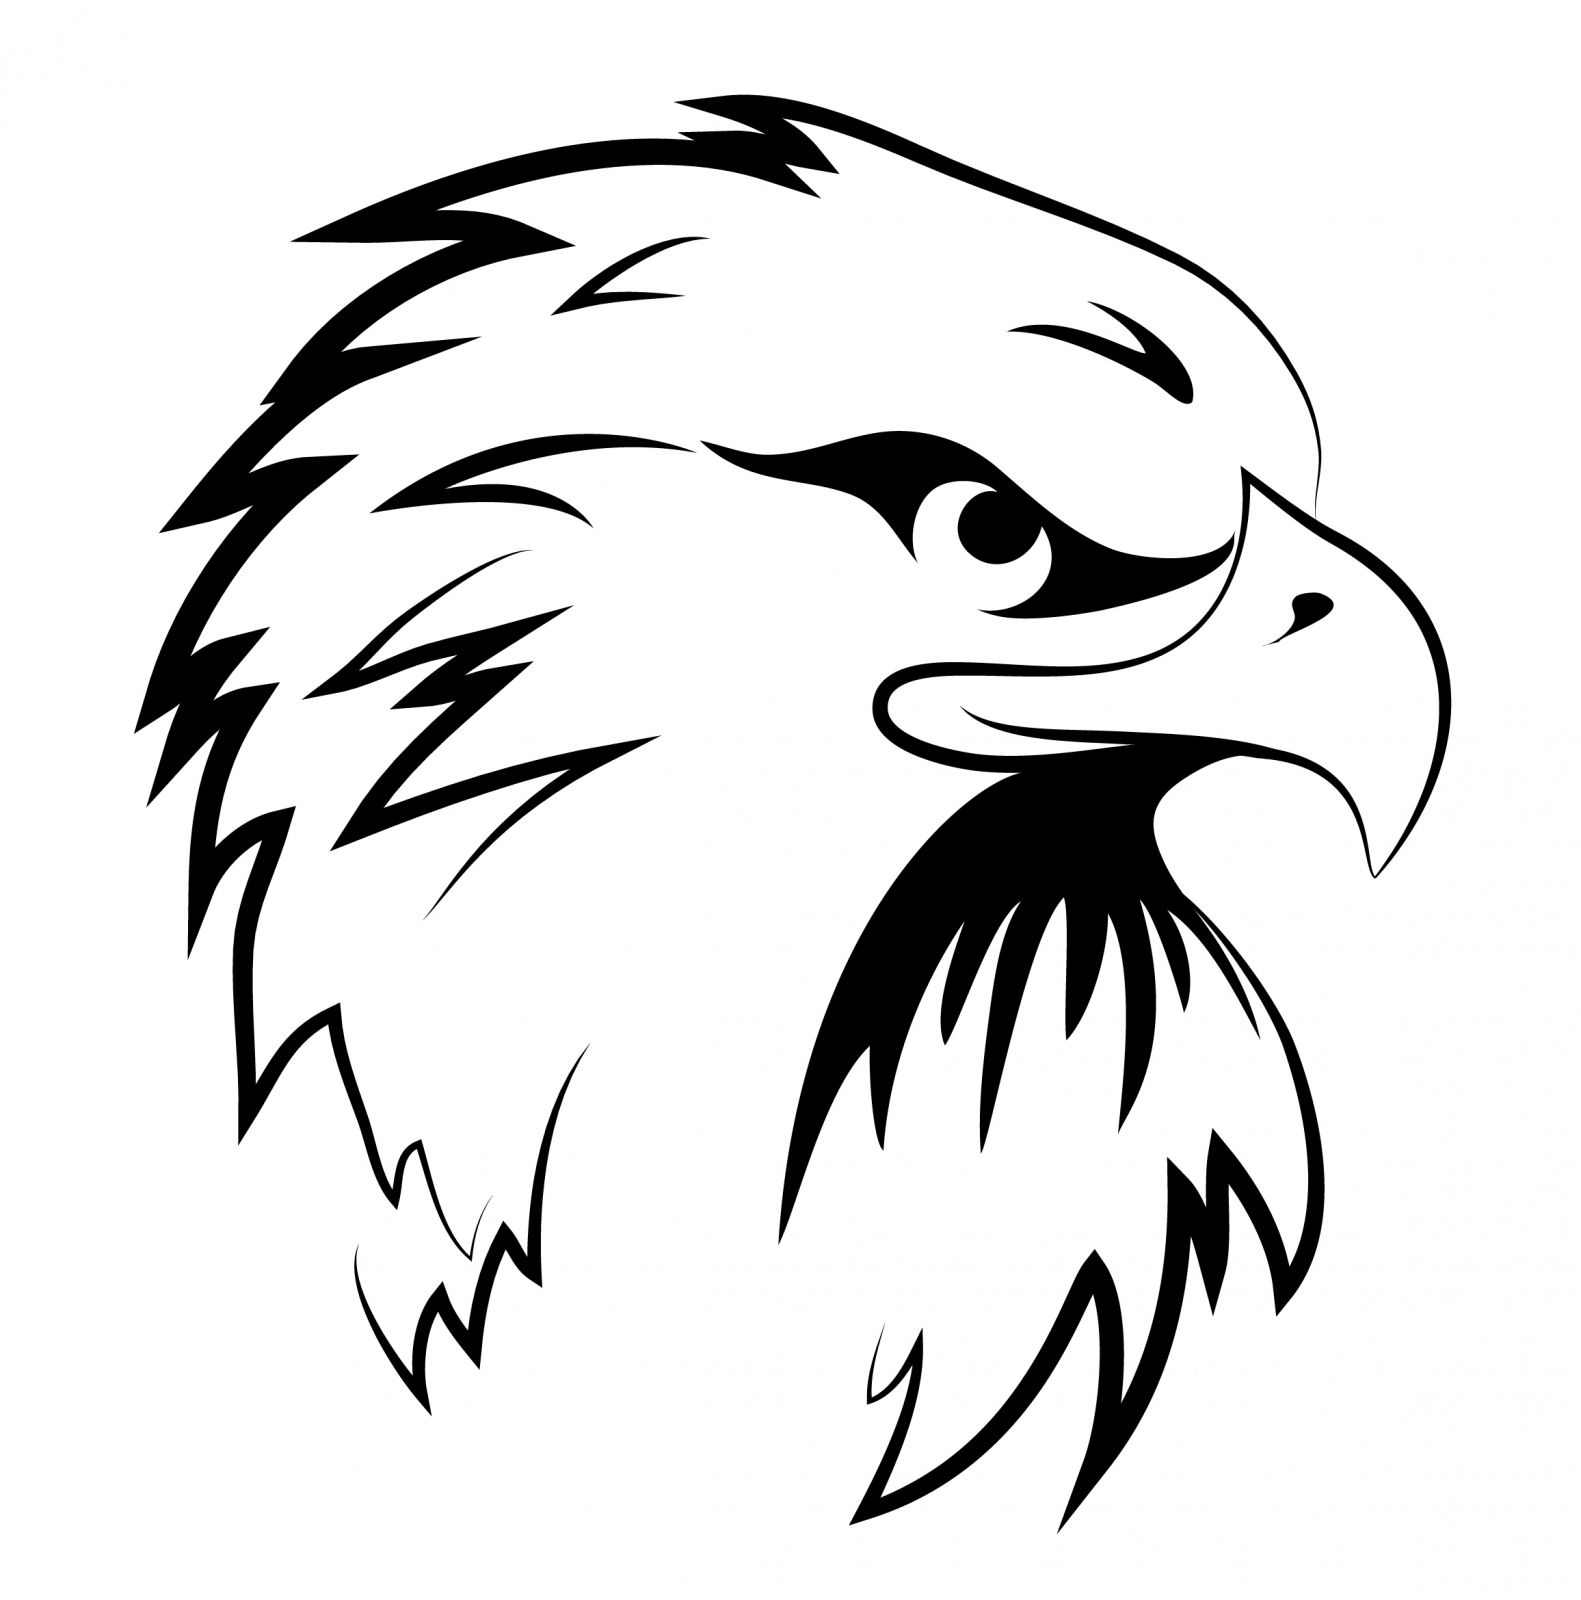 Black and White Eagle Head Clipart.